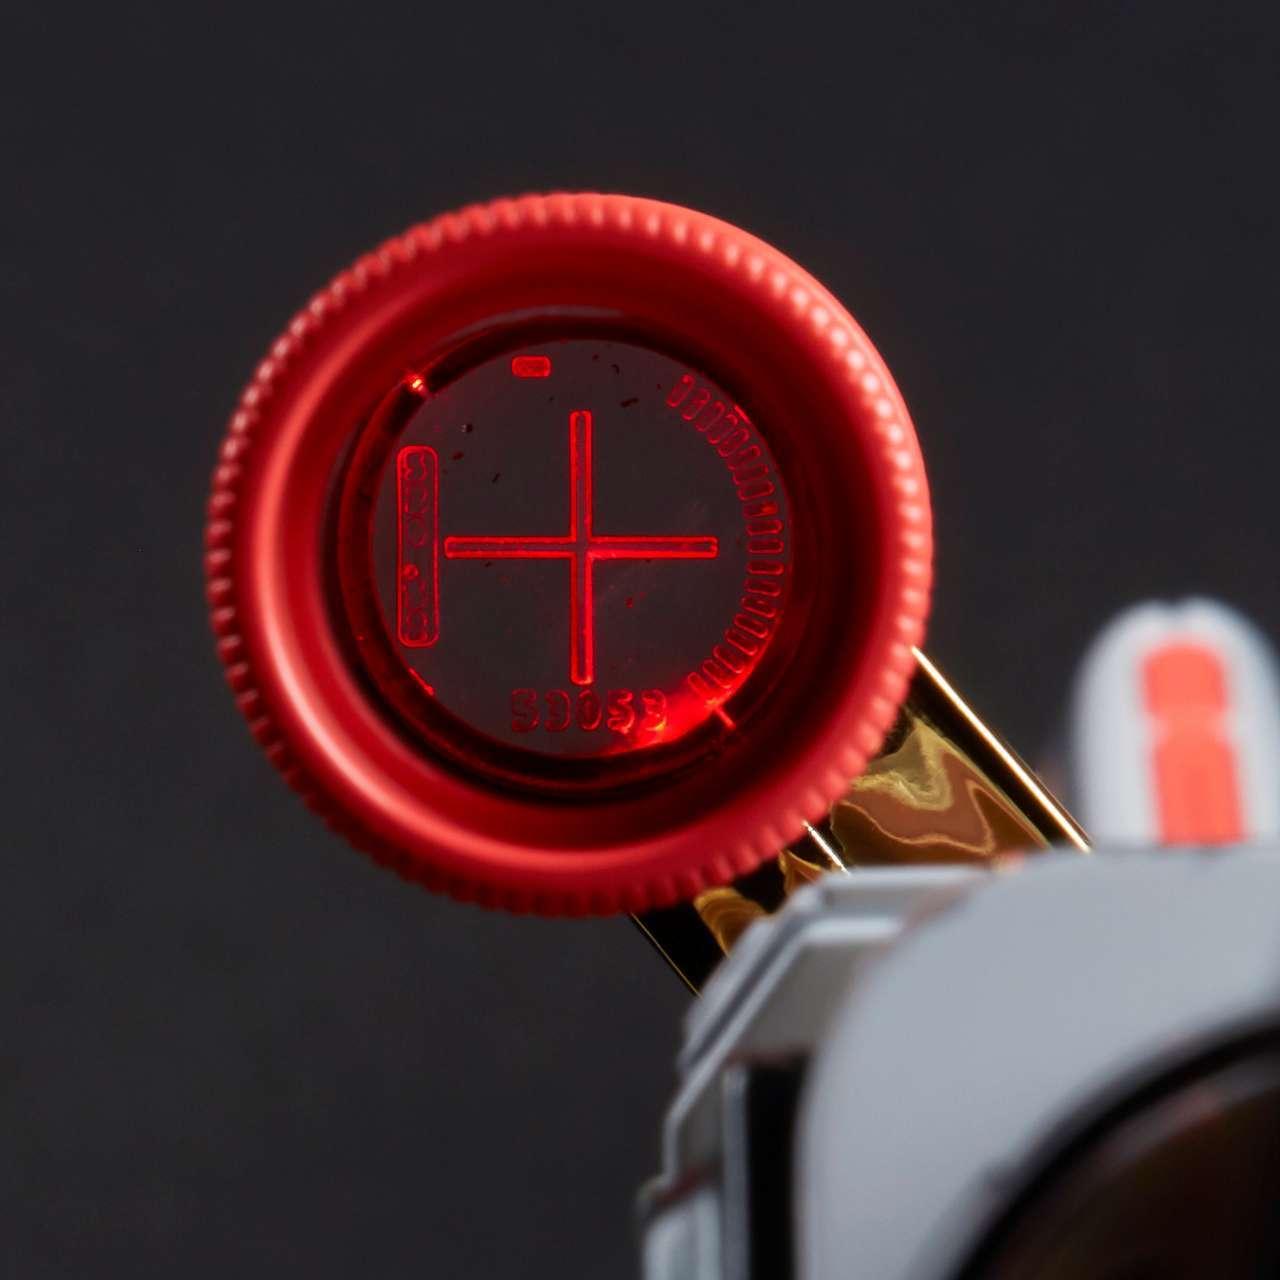 Nerf Star Wars The Mandalorian Amban Phase-pulse Blaster 9